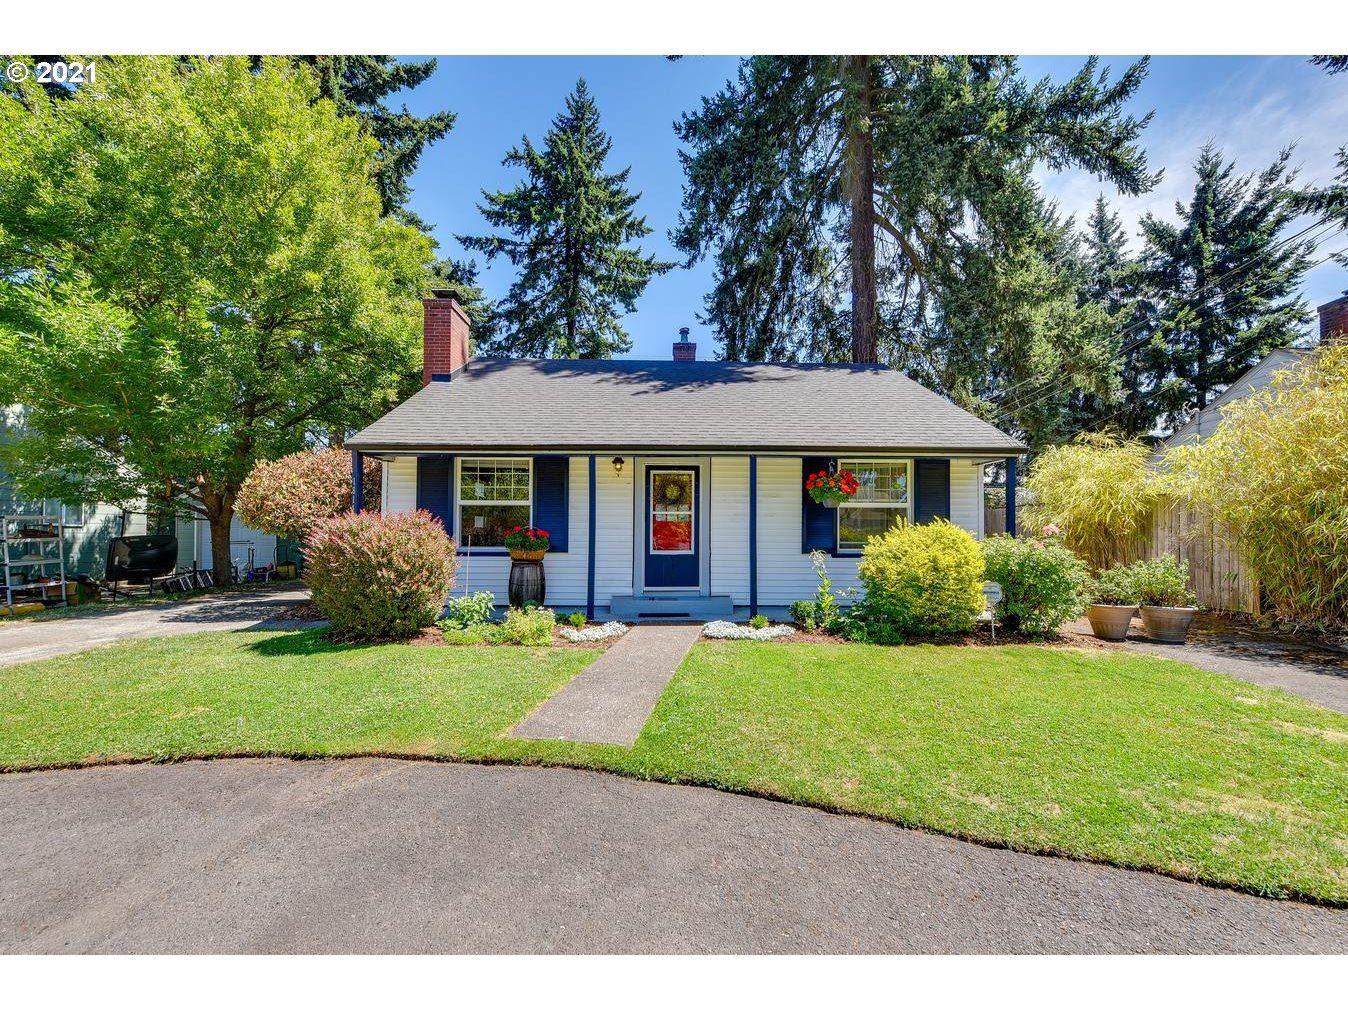 1814 NE 101ST AVE, Portland, OR 97220 - MLS#: 21242847